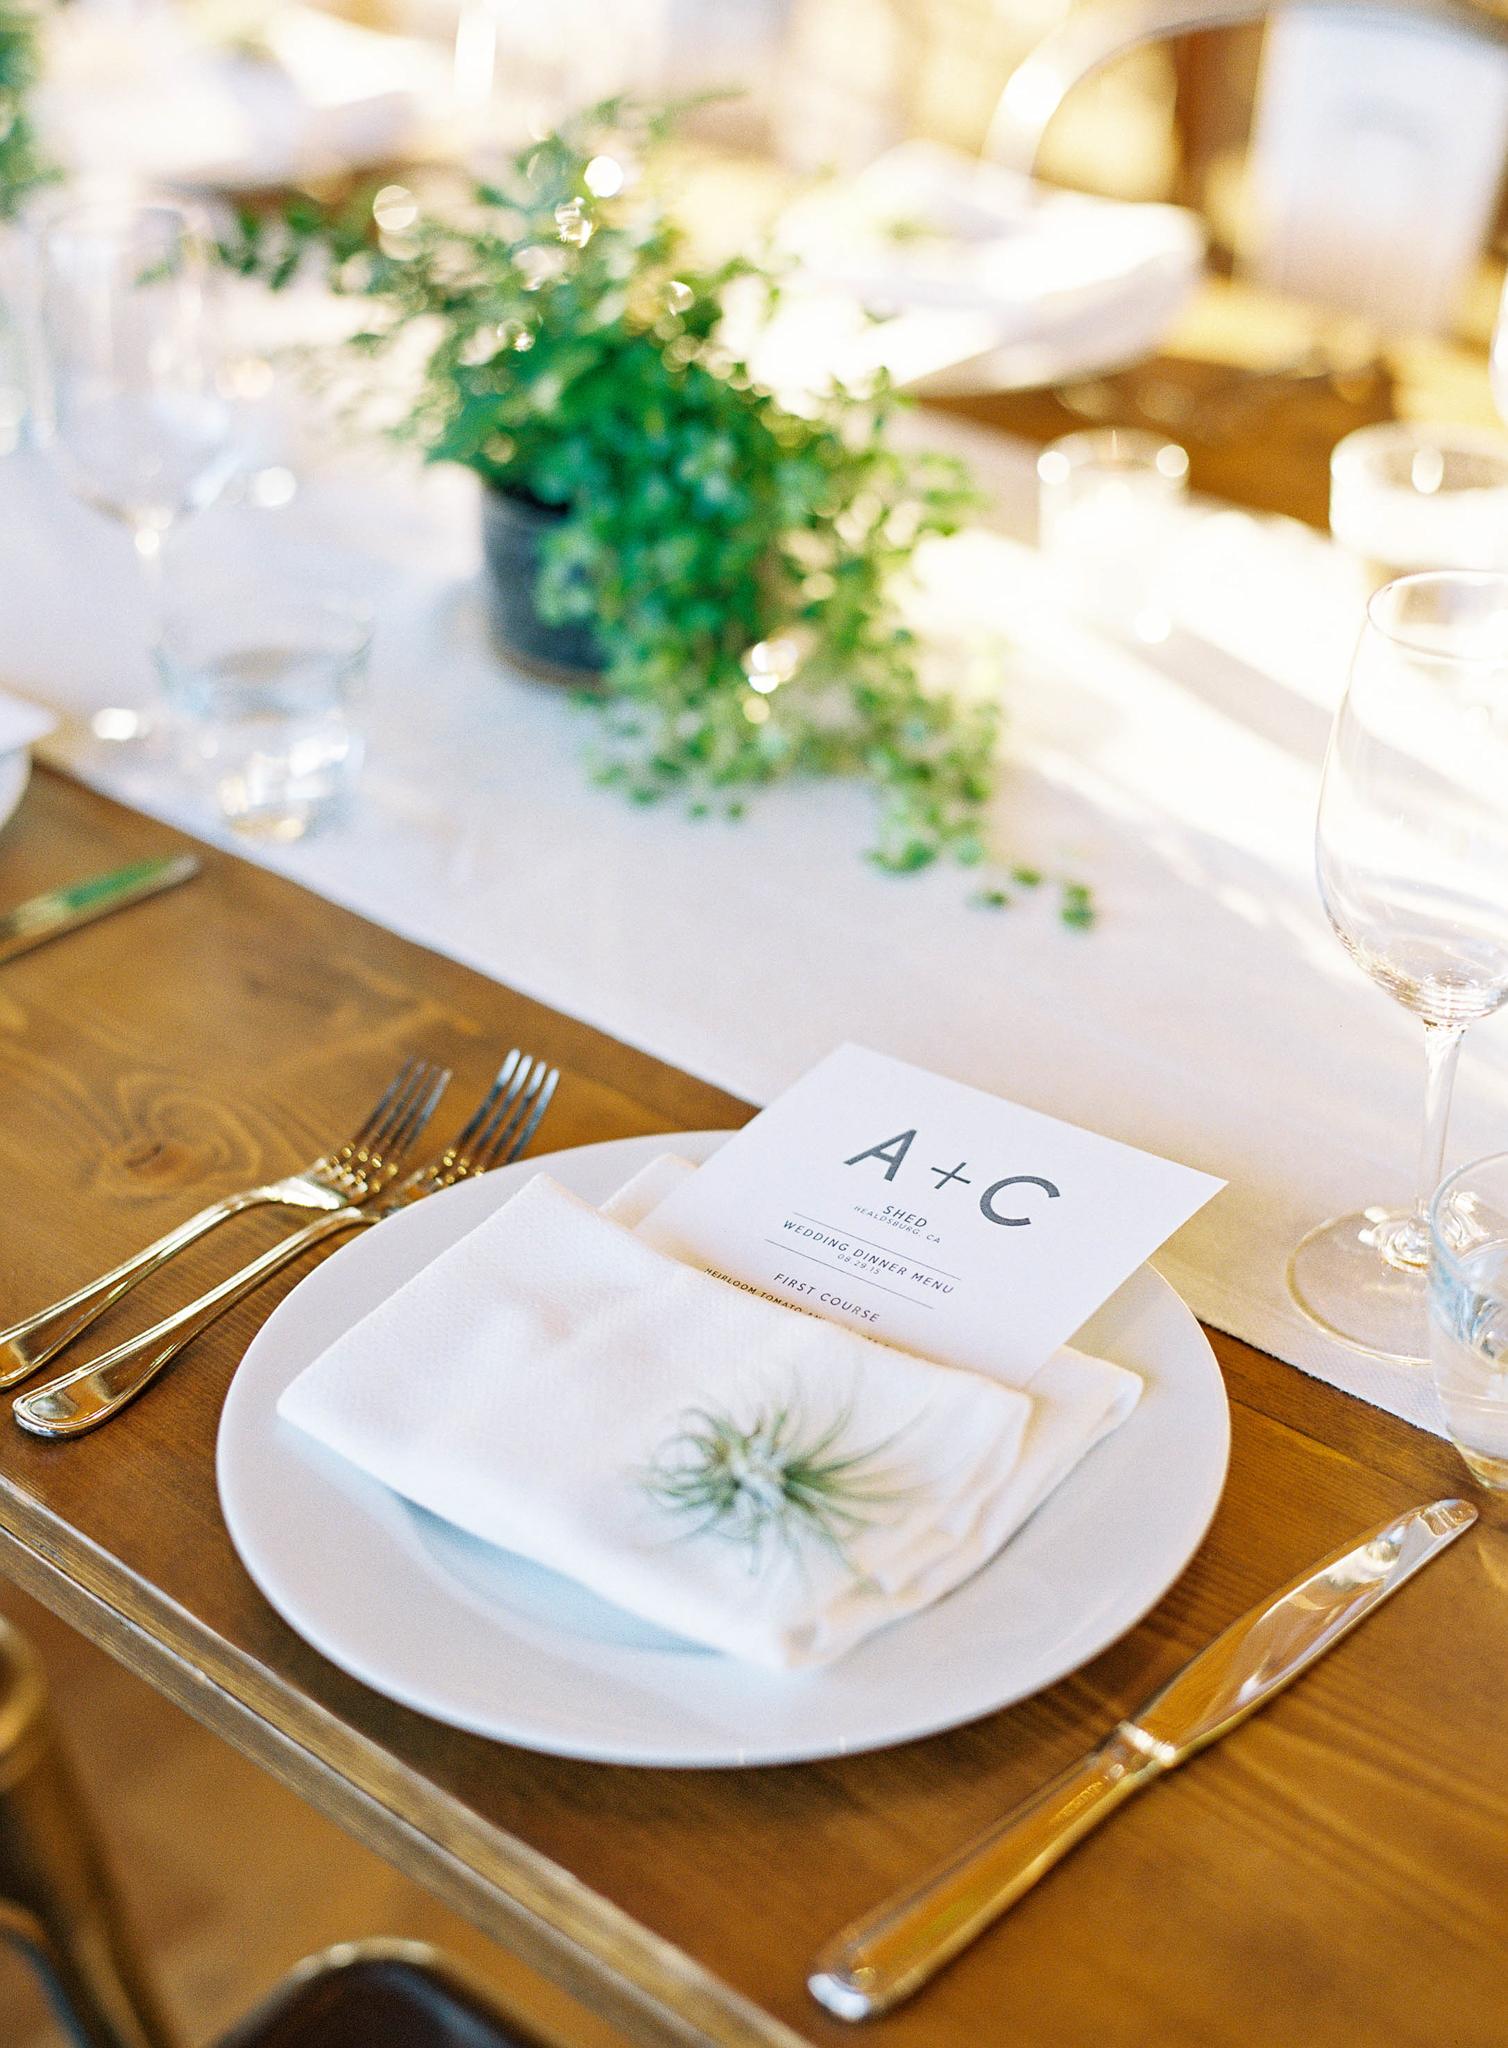 Meghan Mehan Photography - Fine Art Film Wedding Photography - San Francisco   Napa   Sonoma   Big Sur   Chicago   Minneapolis   Milwaukee   Lake Geneva   Door County   Wisconsin 082.jpg